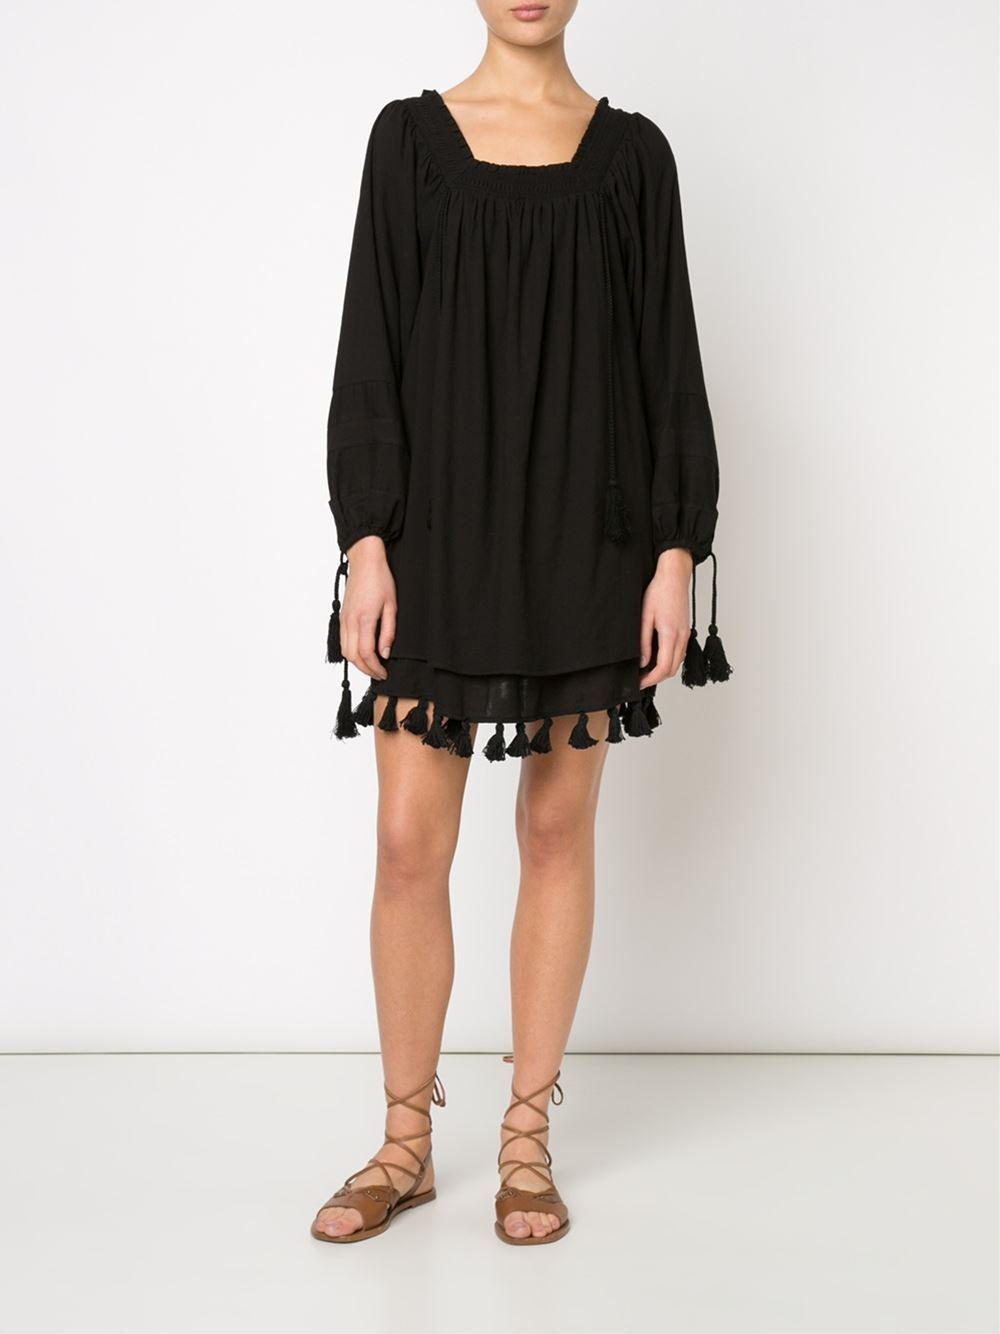 A Piece Apart tasseled tunic dress